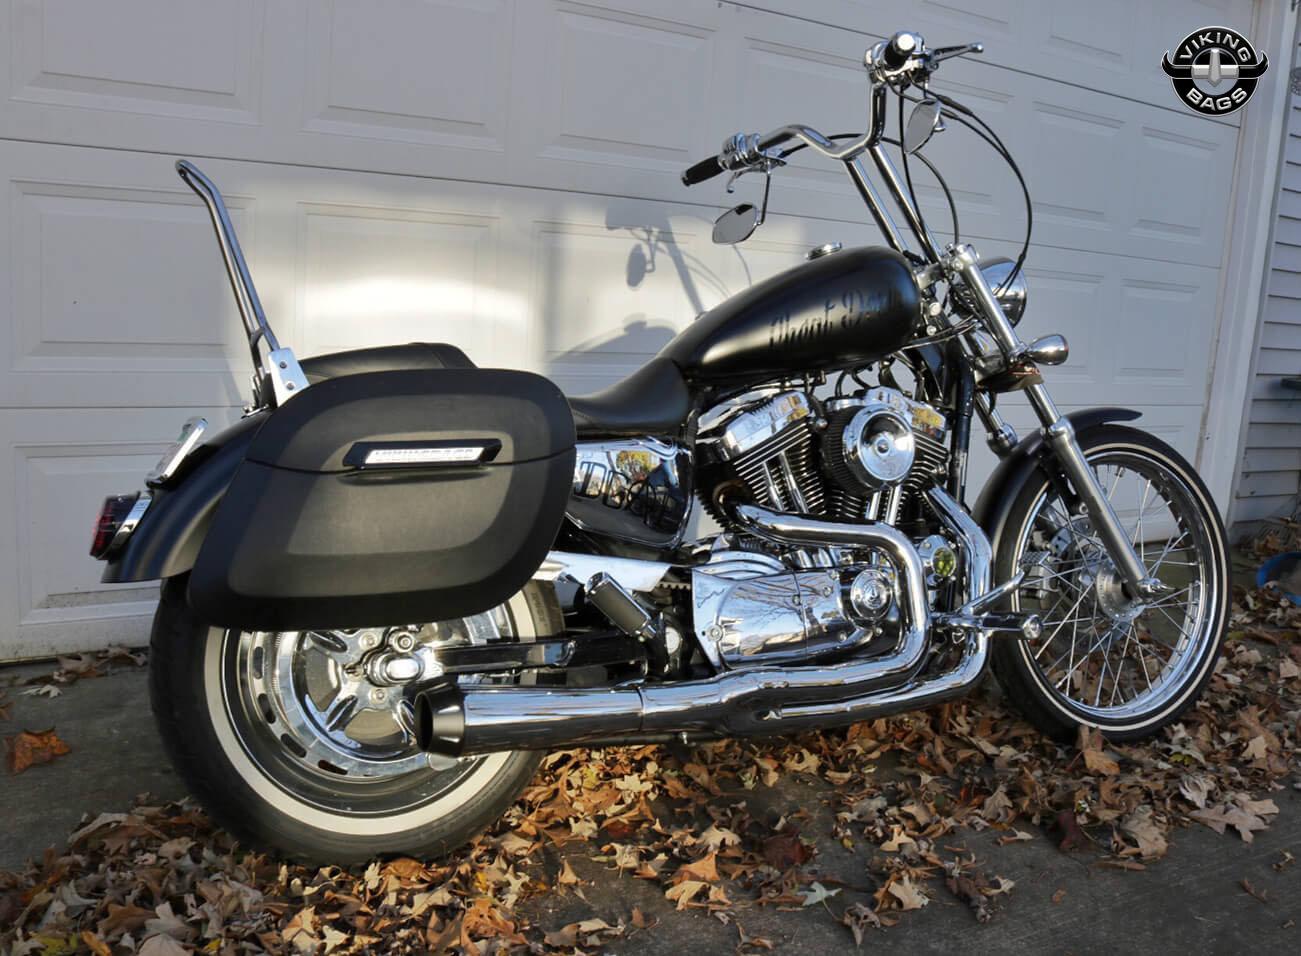 daniel s harley davidson sportster 1200 custom w lamellar hard saddlebags  [ 1301 x 956 Pixel ]